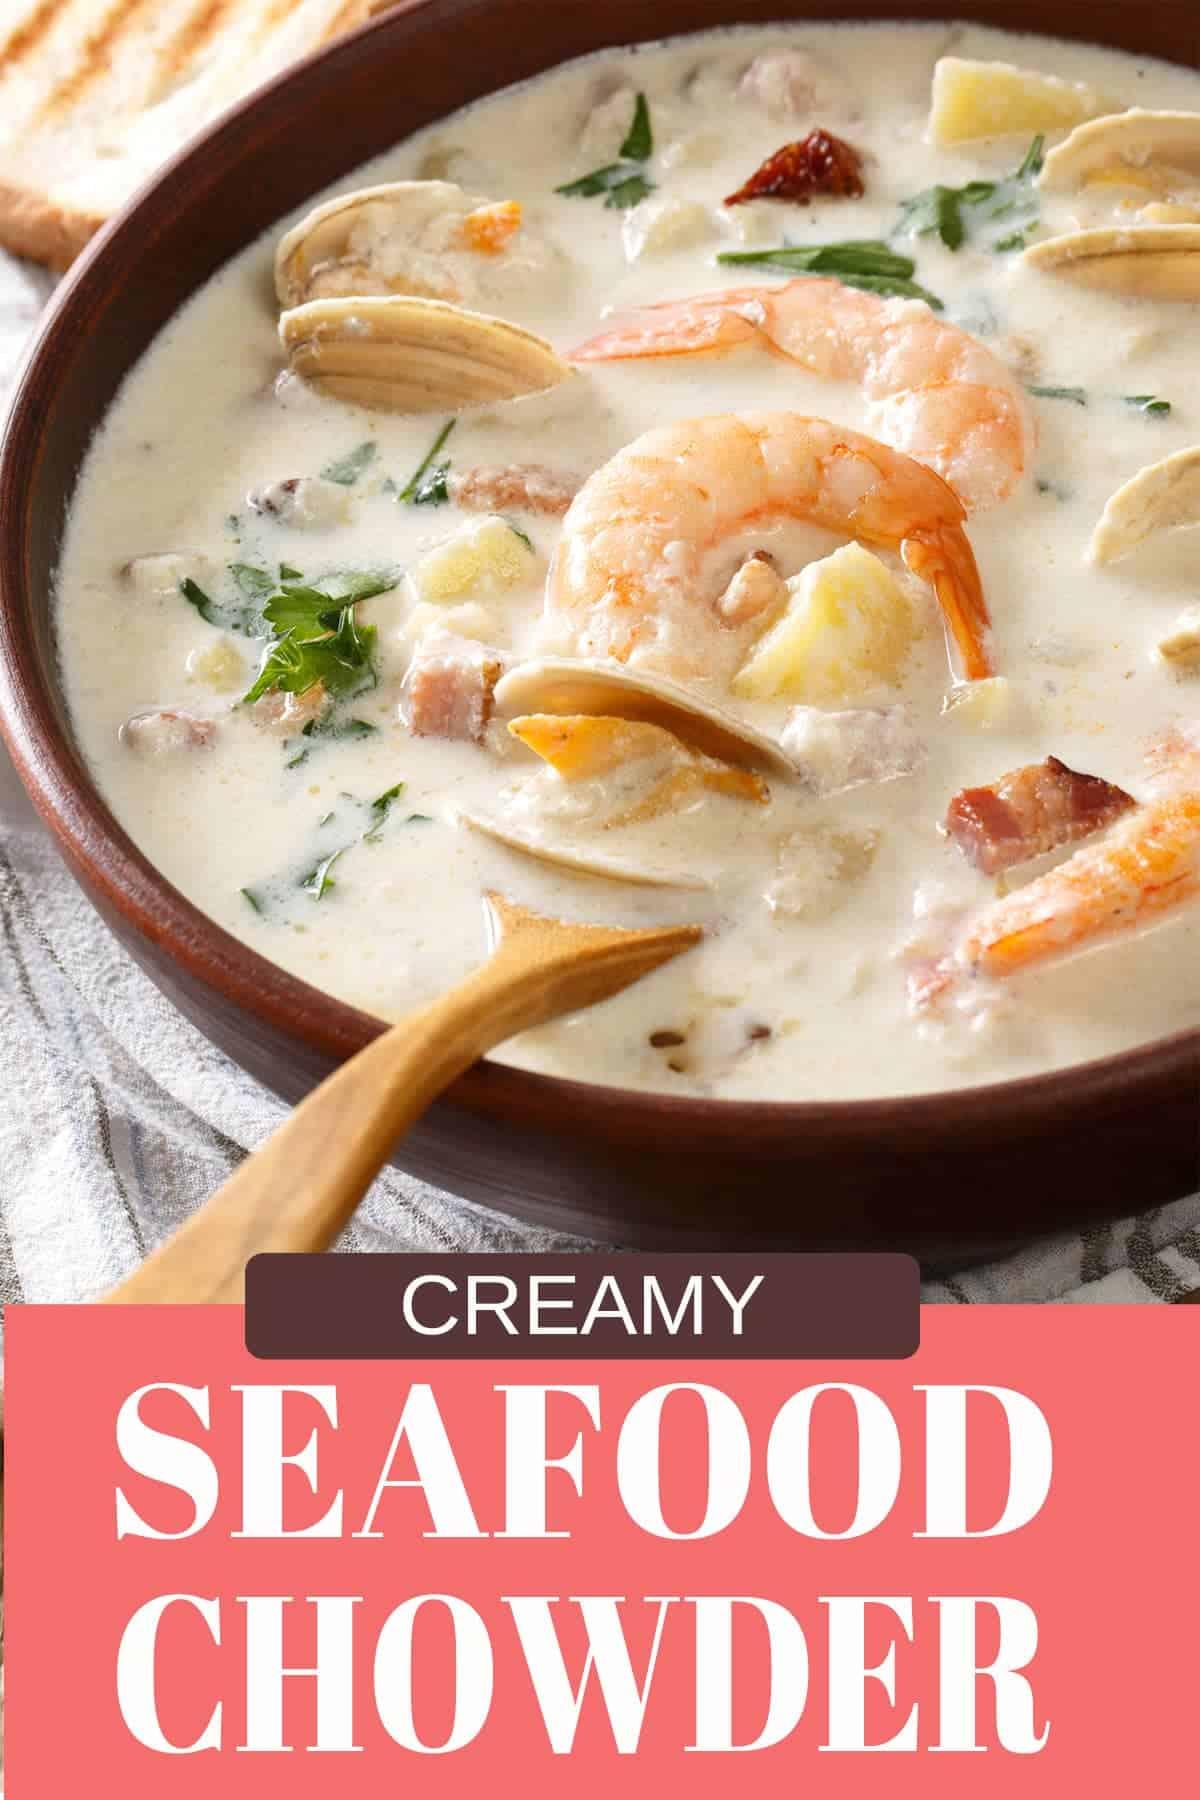 Creamy Seafood Chowder Recipe